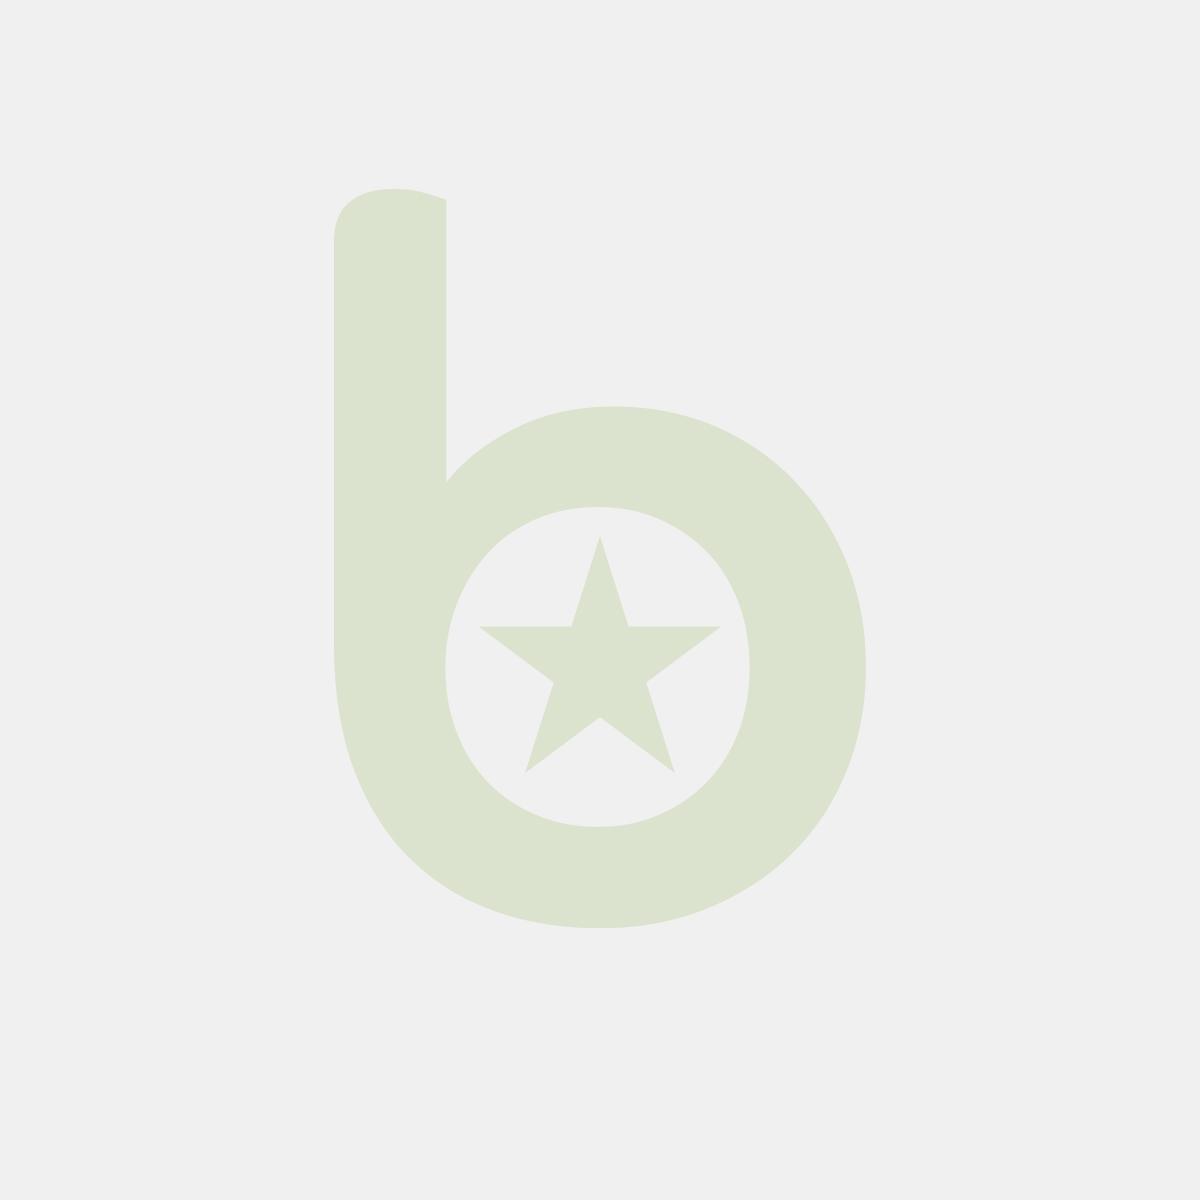 Talerzyk krystaliczny 7x7cm op.50szt - FINGERFOOD